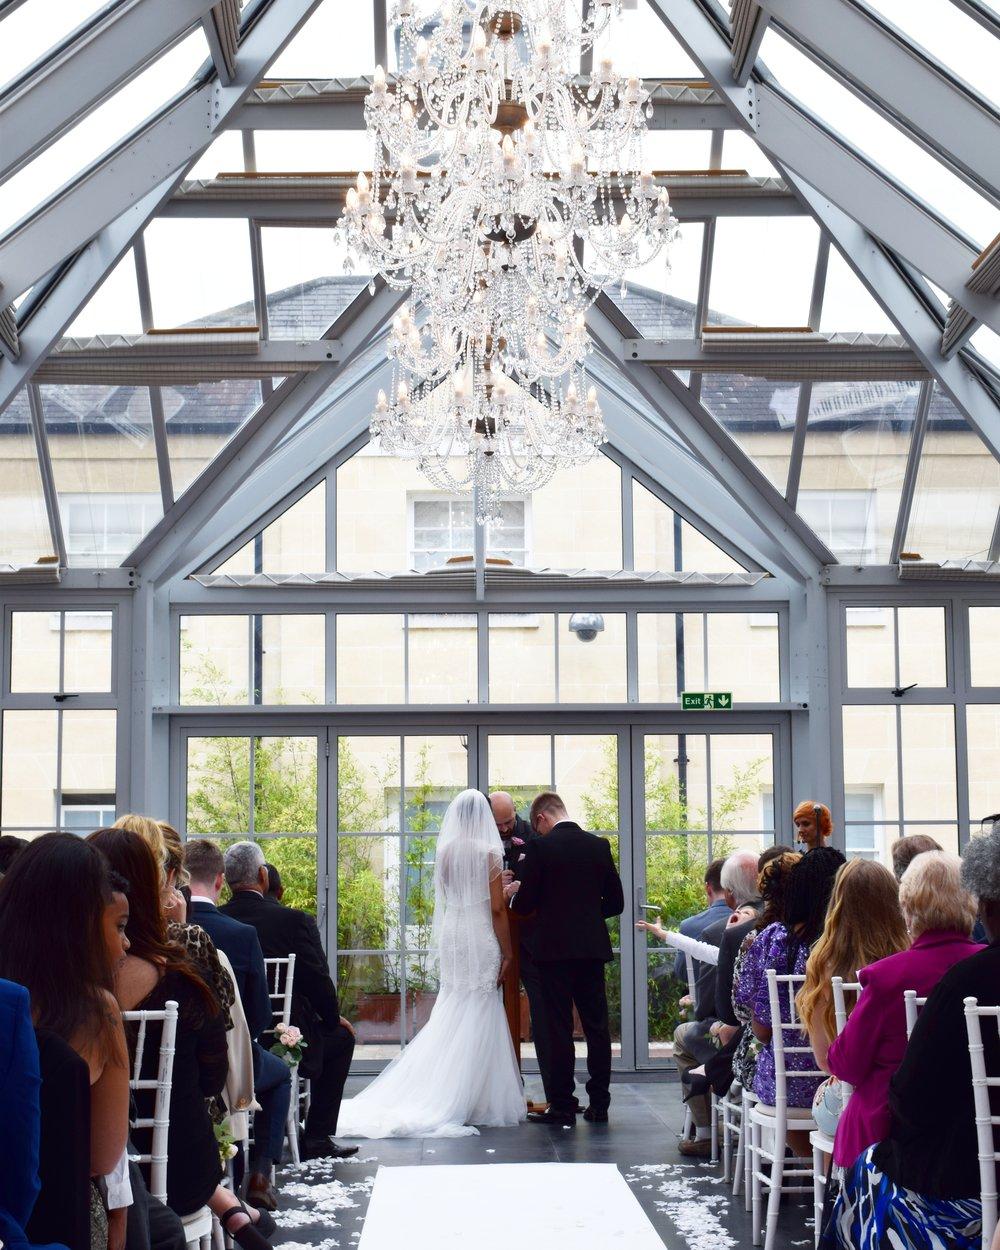 Wedding photo ideas: Botleys Mansion Chertsey wedding venue ceremony